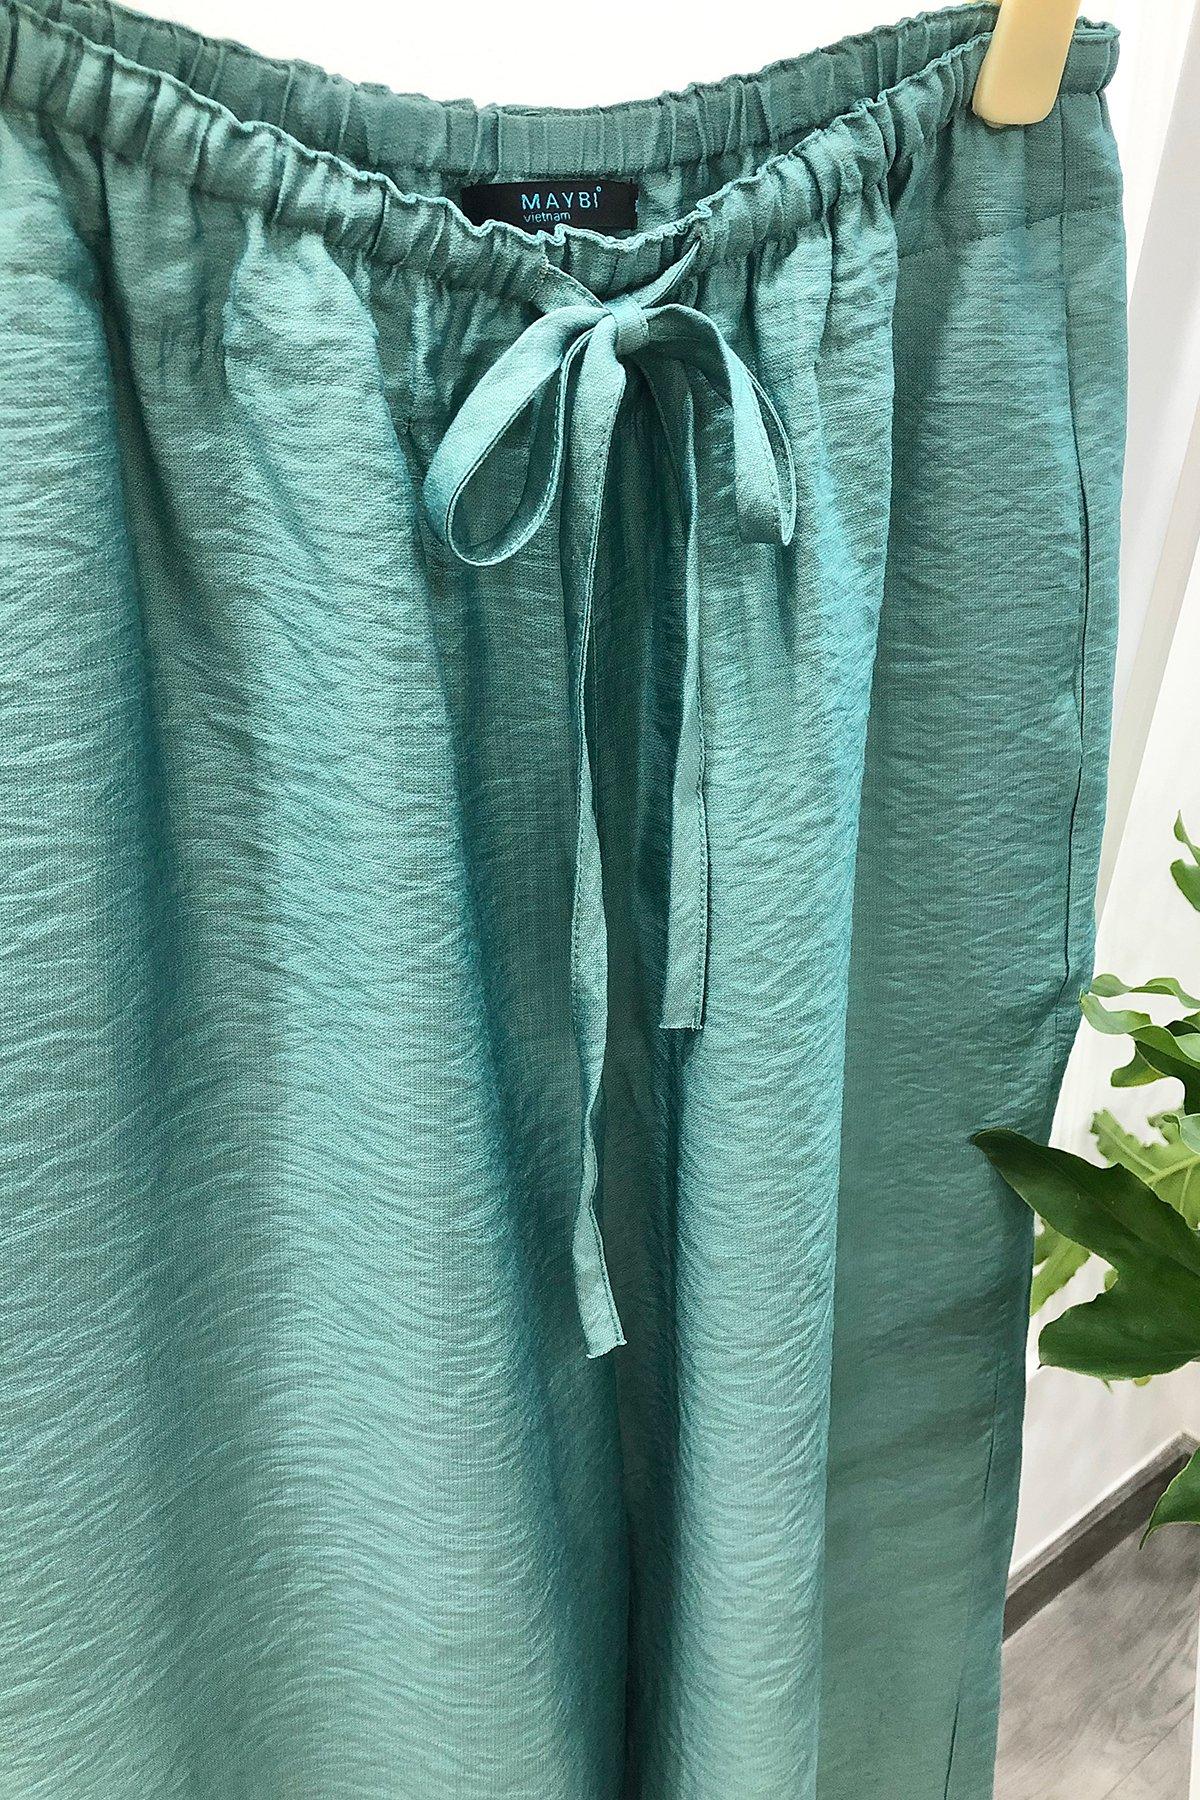 Quần ống rộng xanh ngọc Wedgewood trousers